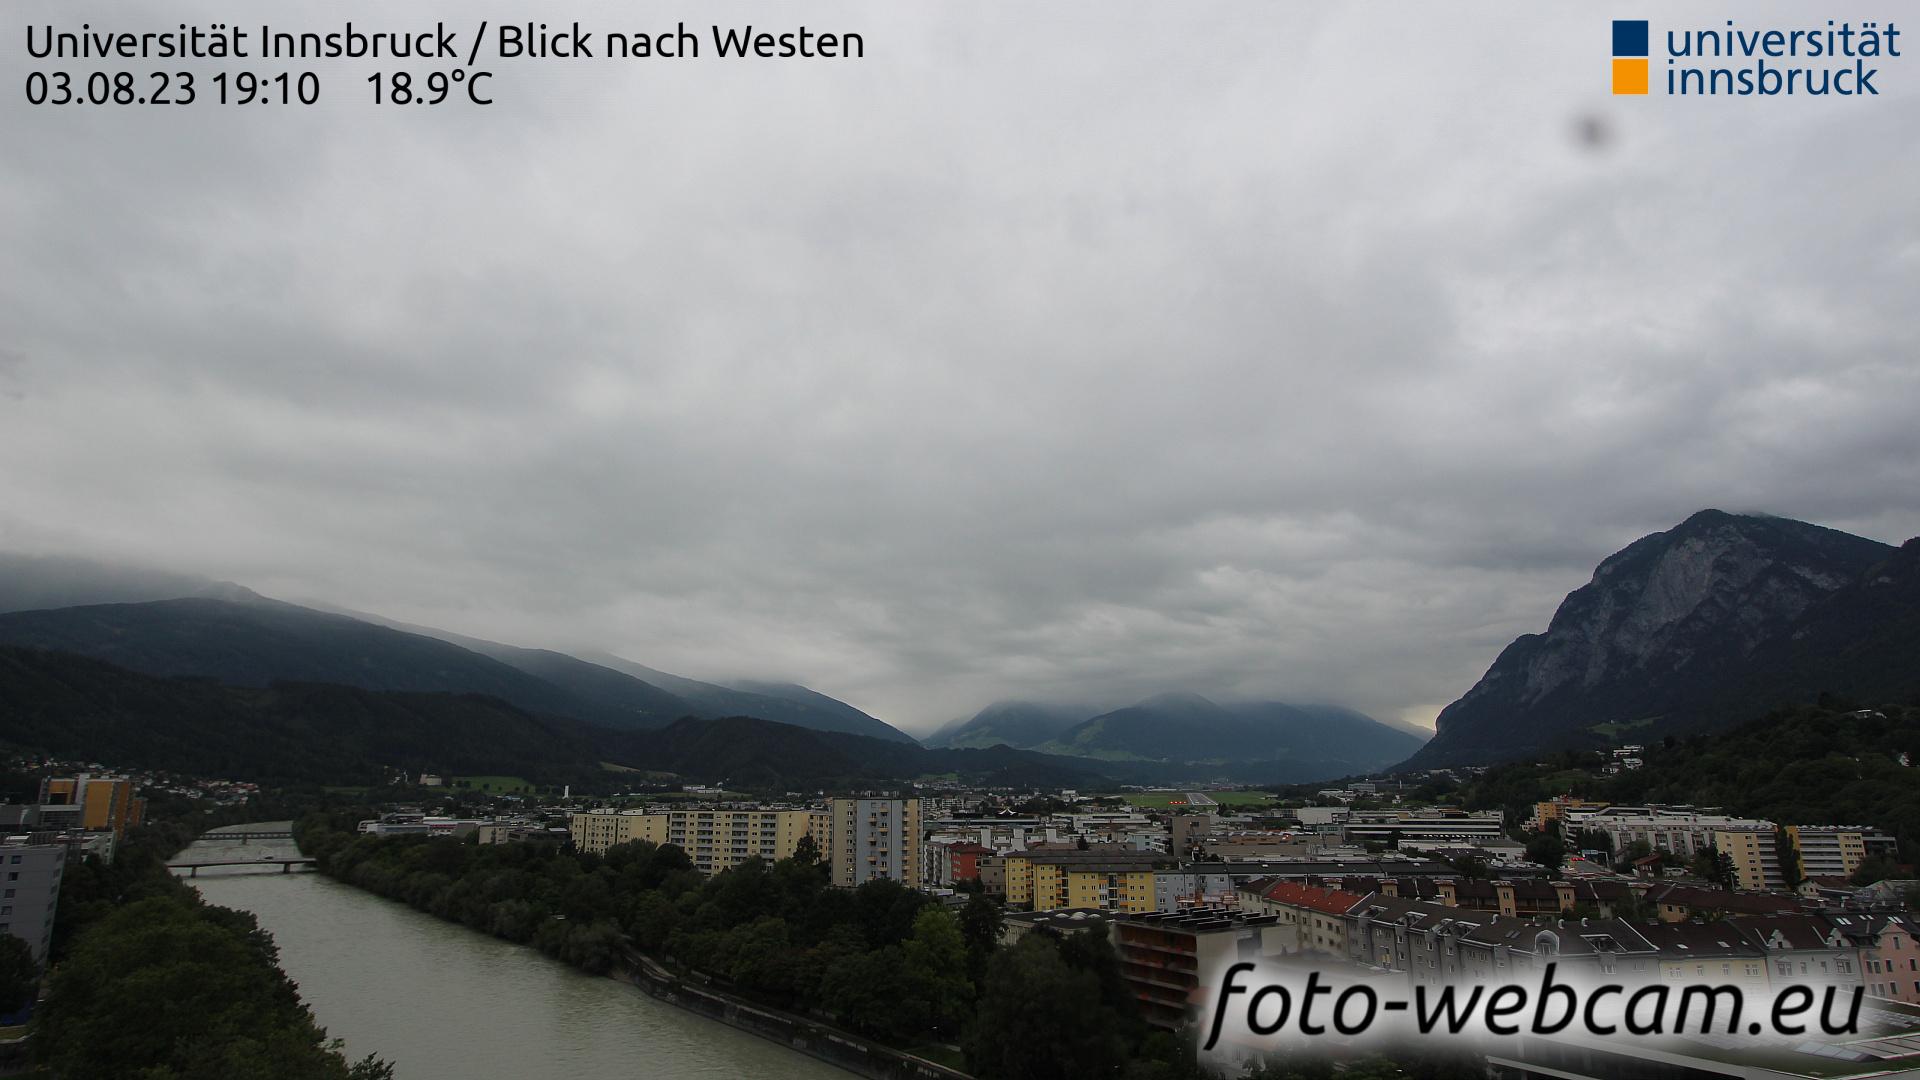 Innsbruck Sun. 19:25